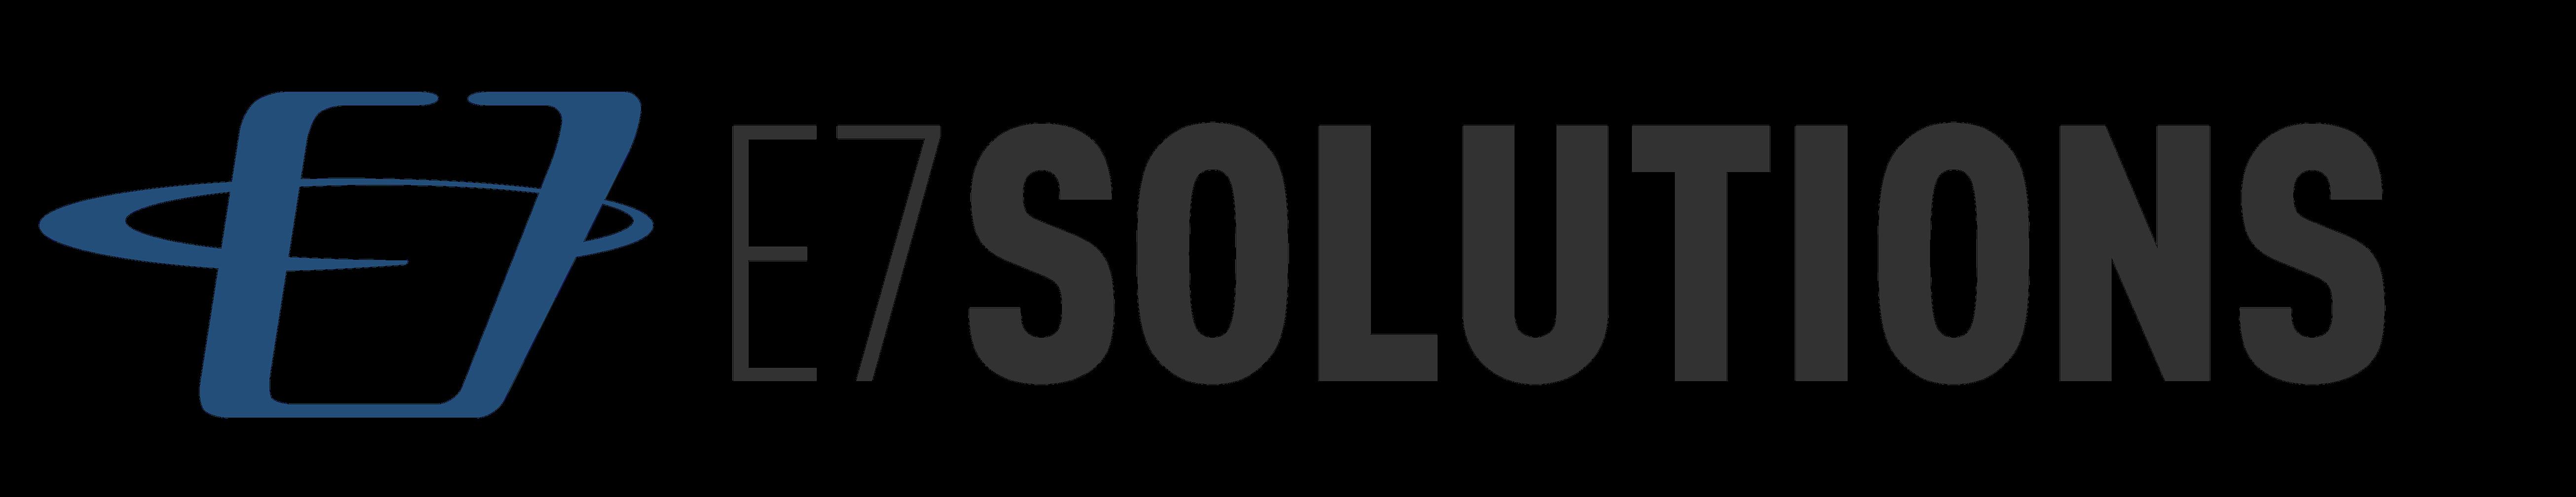 E7Solutions